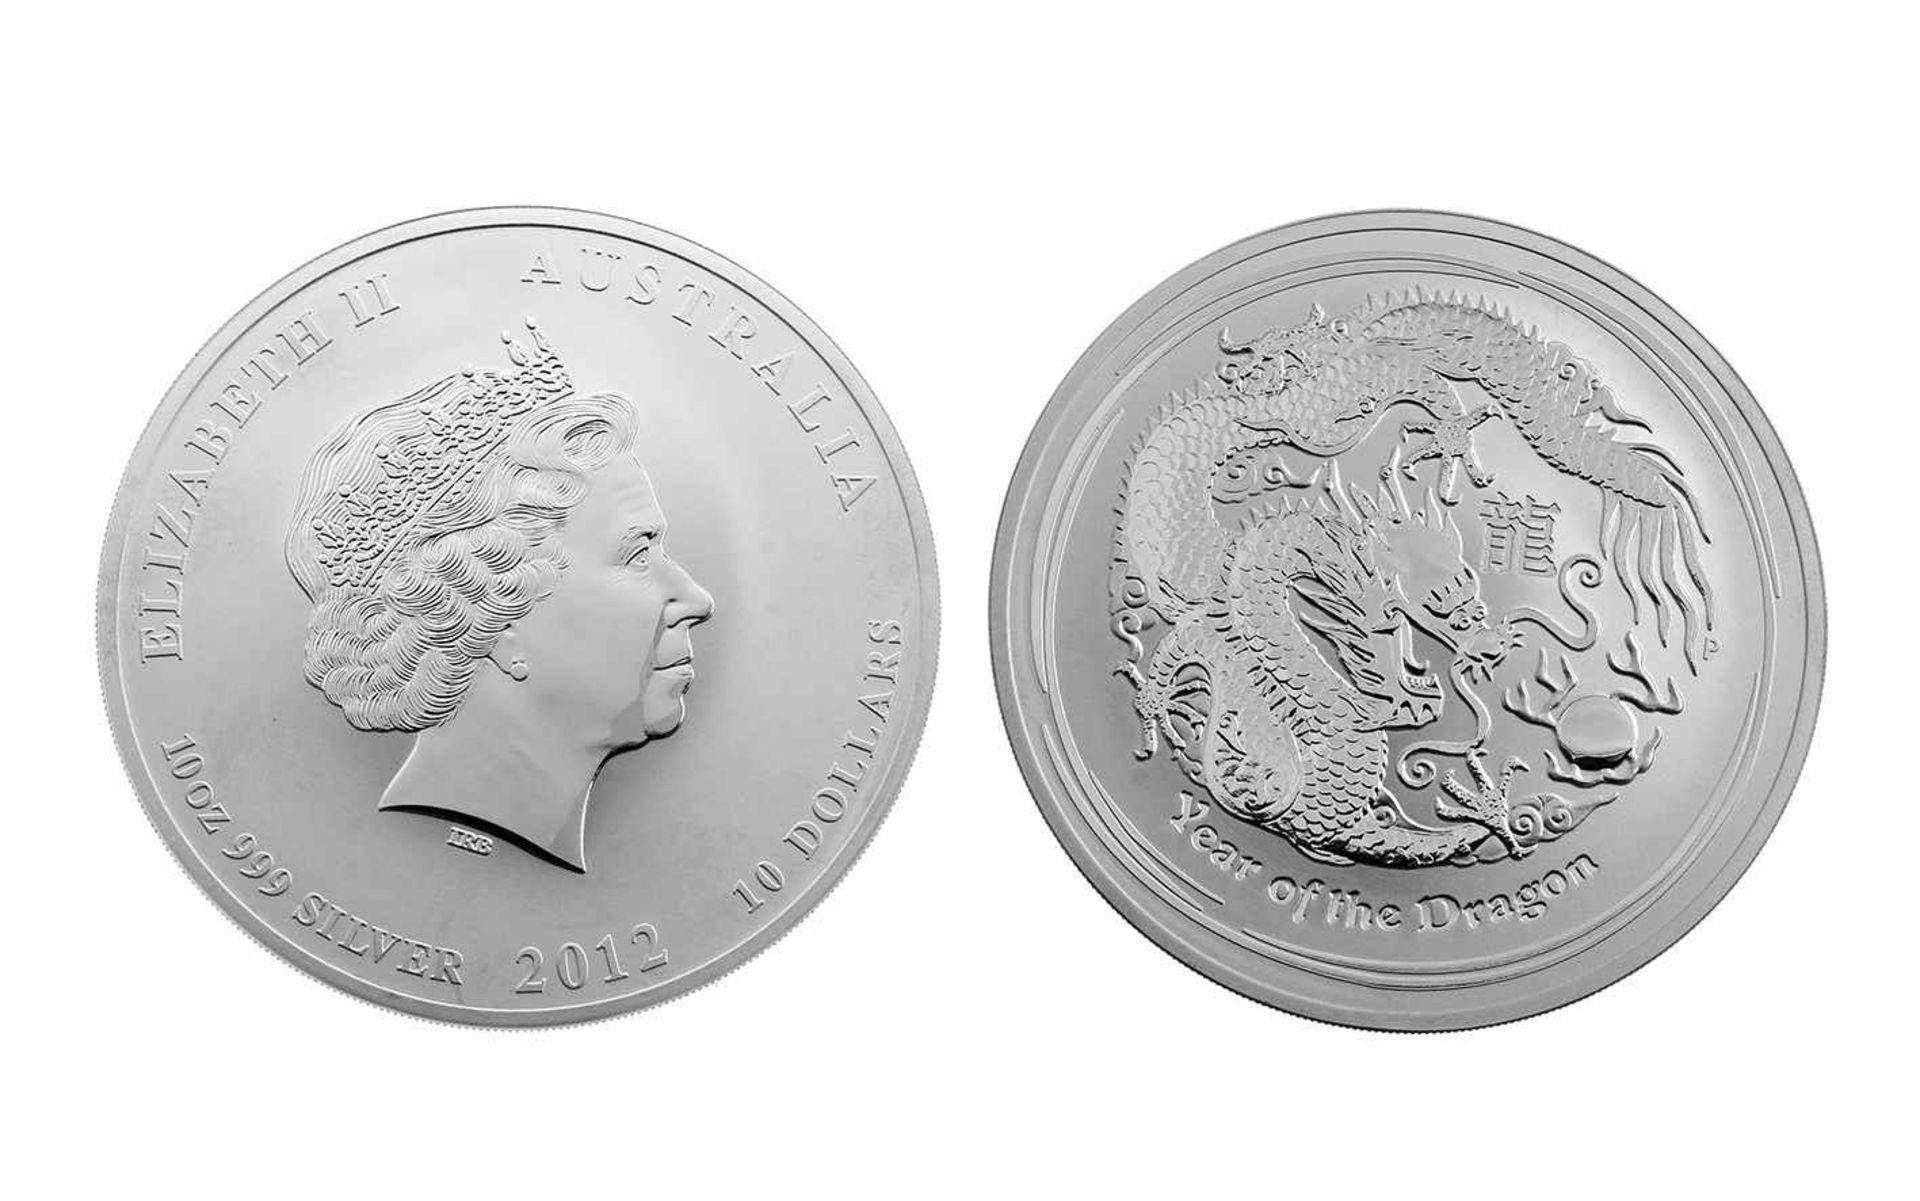 Los 105 - Münze 10 Dollars 999,9/- Feinsilber 10 Unze 311,60 g Elizabeth II Australia Year of the Dragon